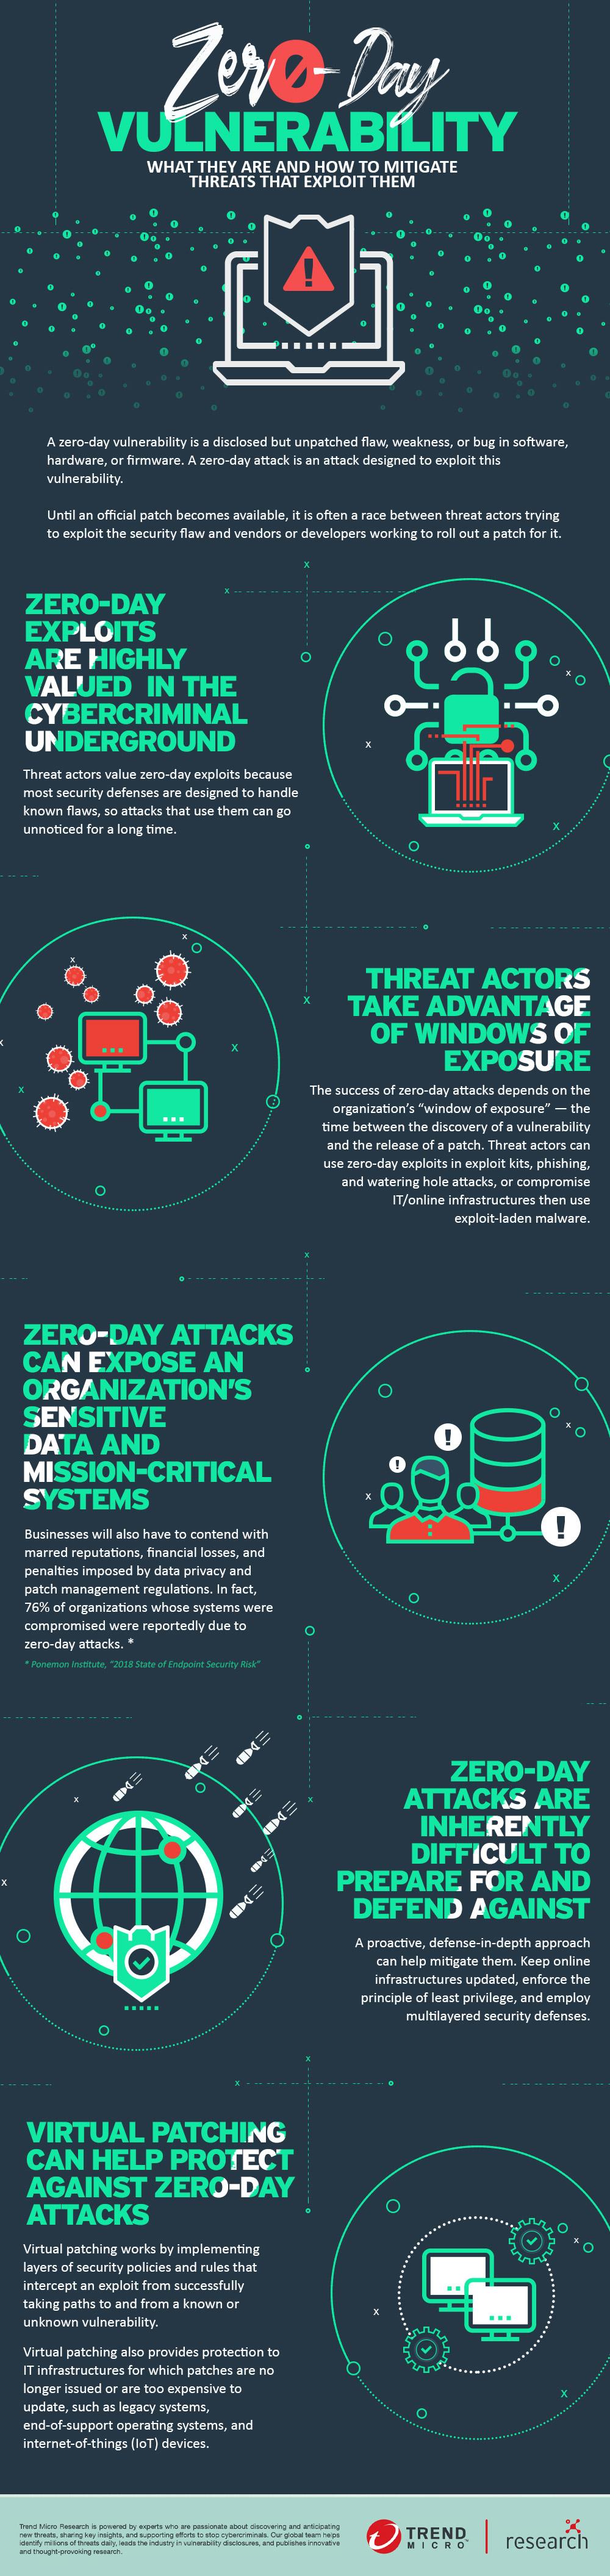 Security 101: Zero-Day Vulnerabilities and Exploits